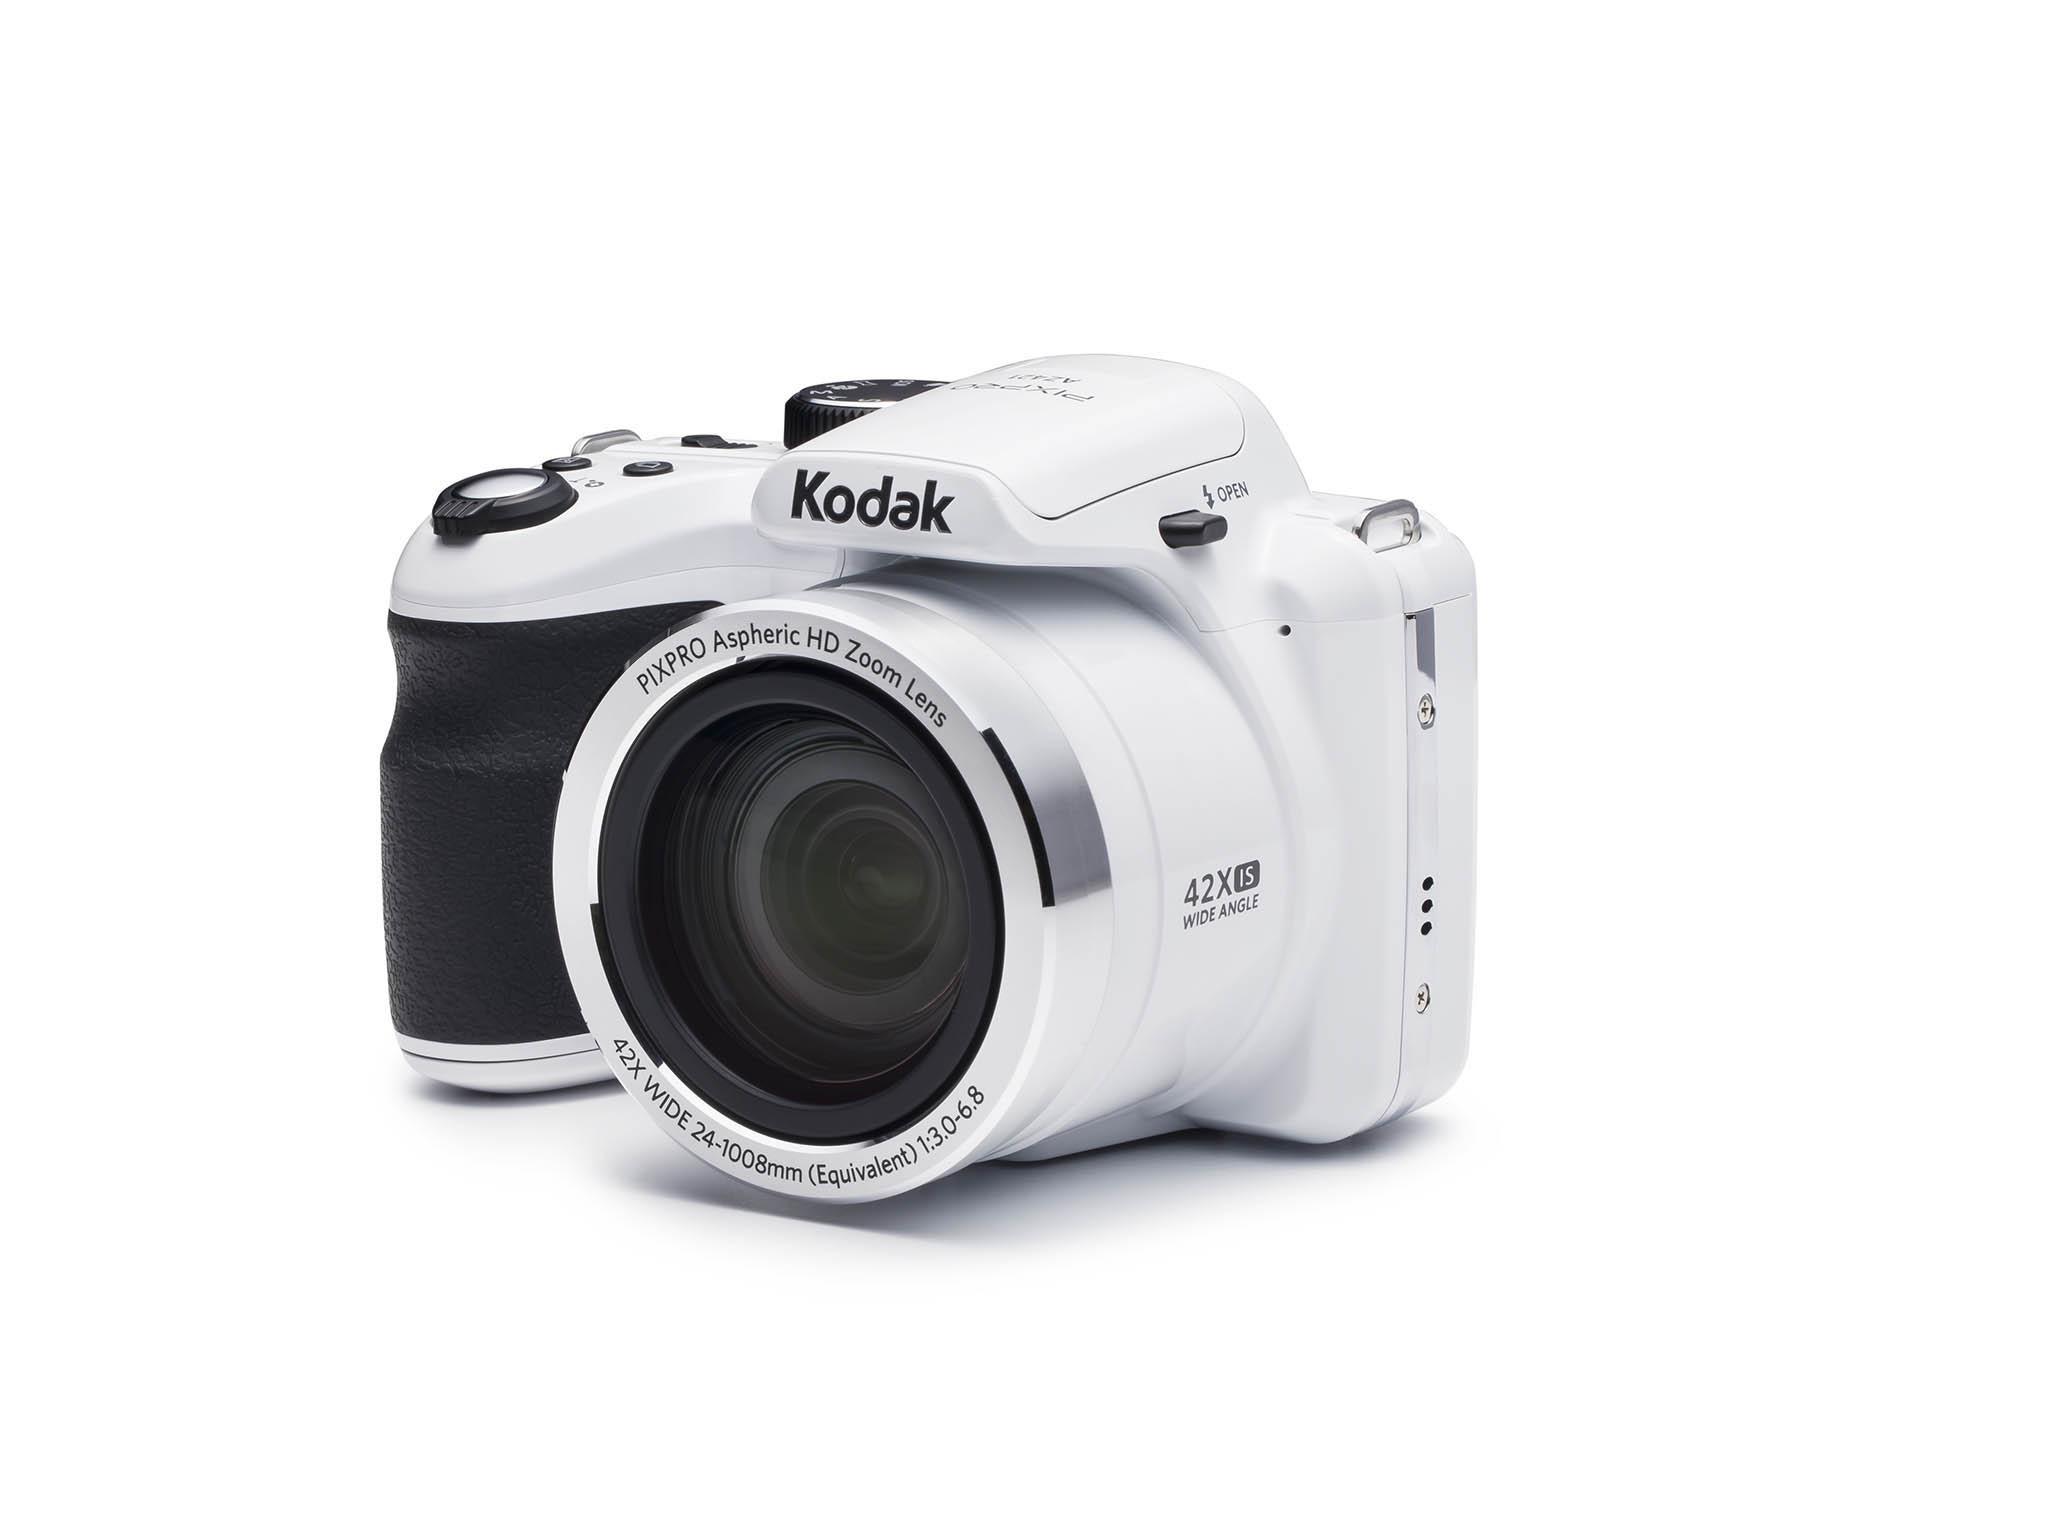 Best bridge cameras: From beginners to shooting wildlife